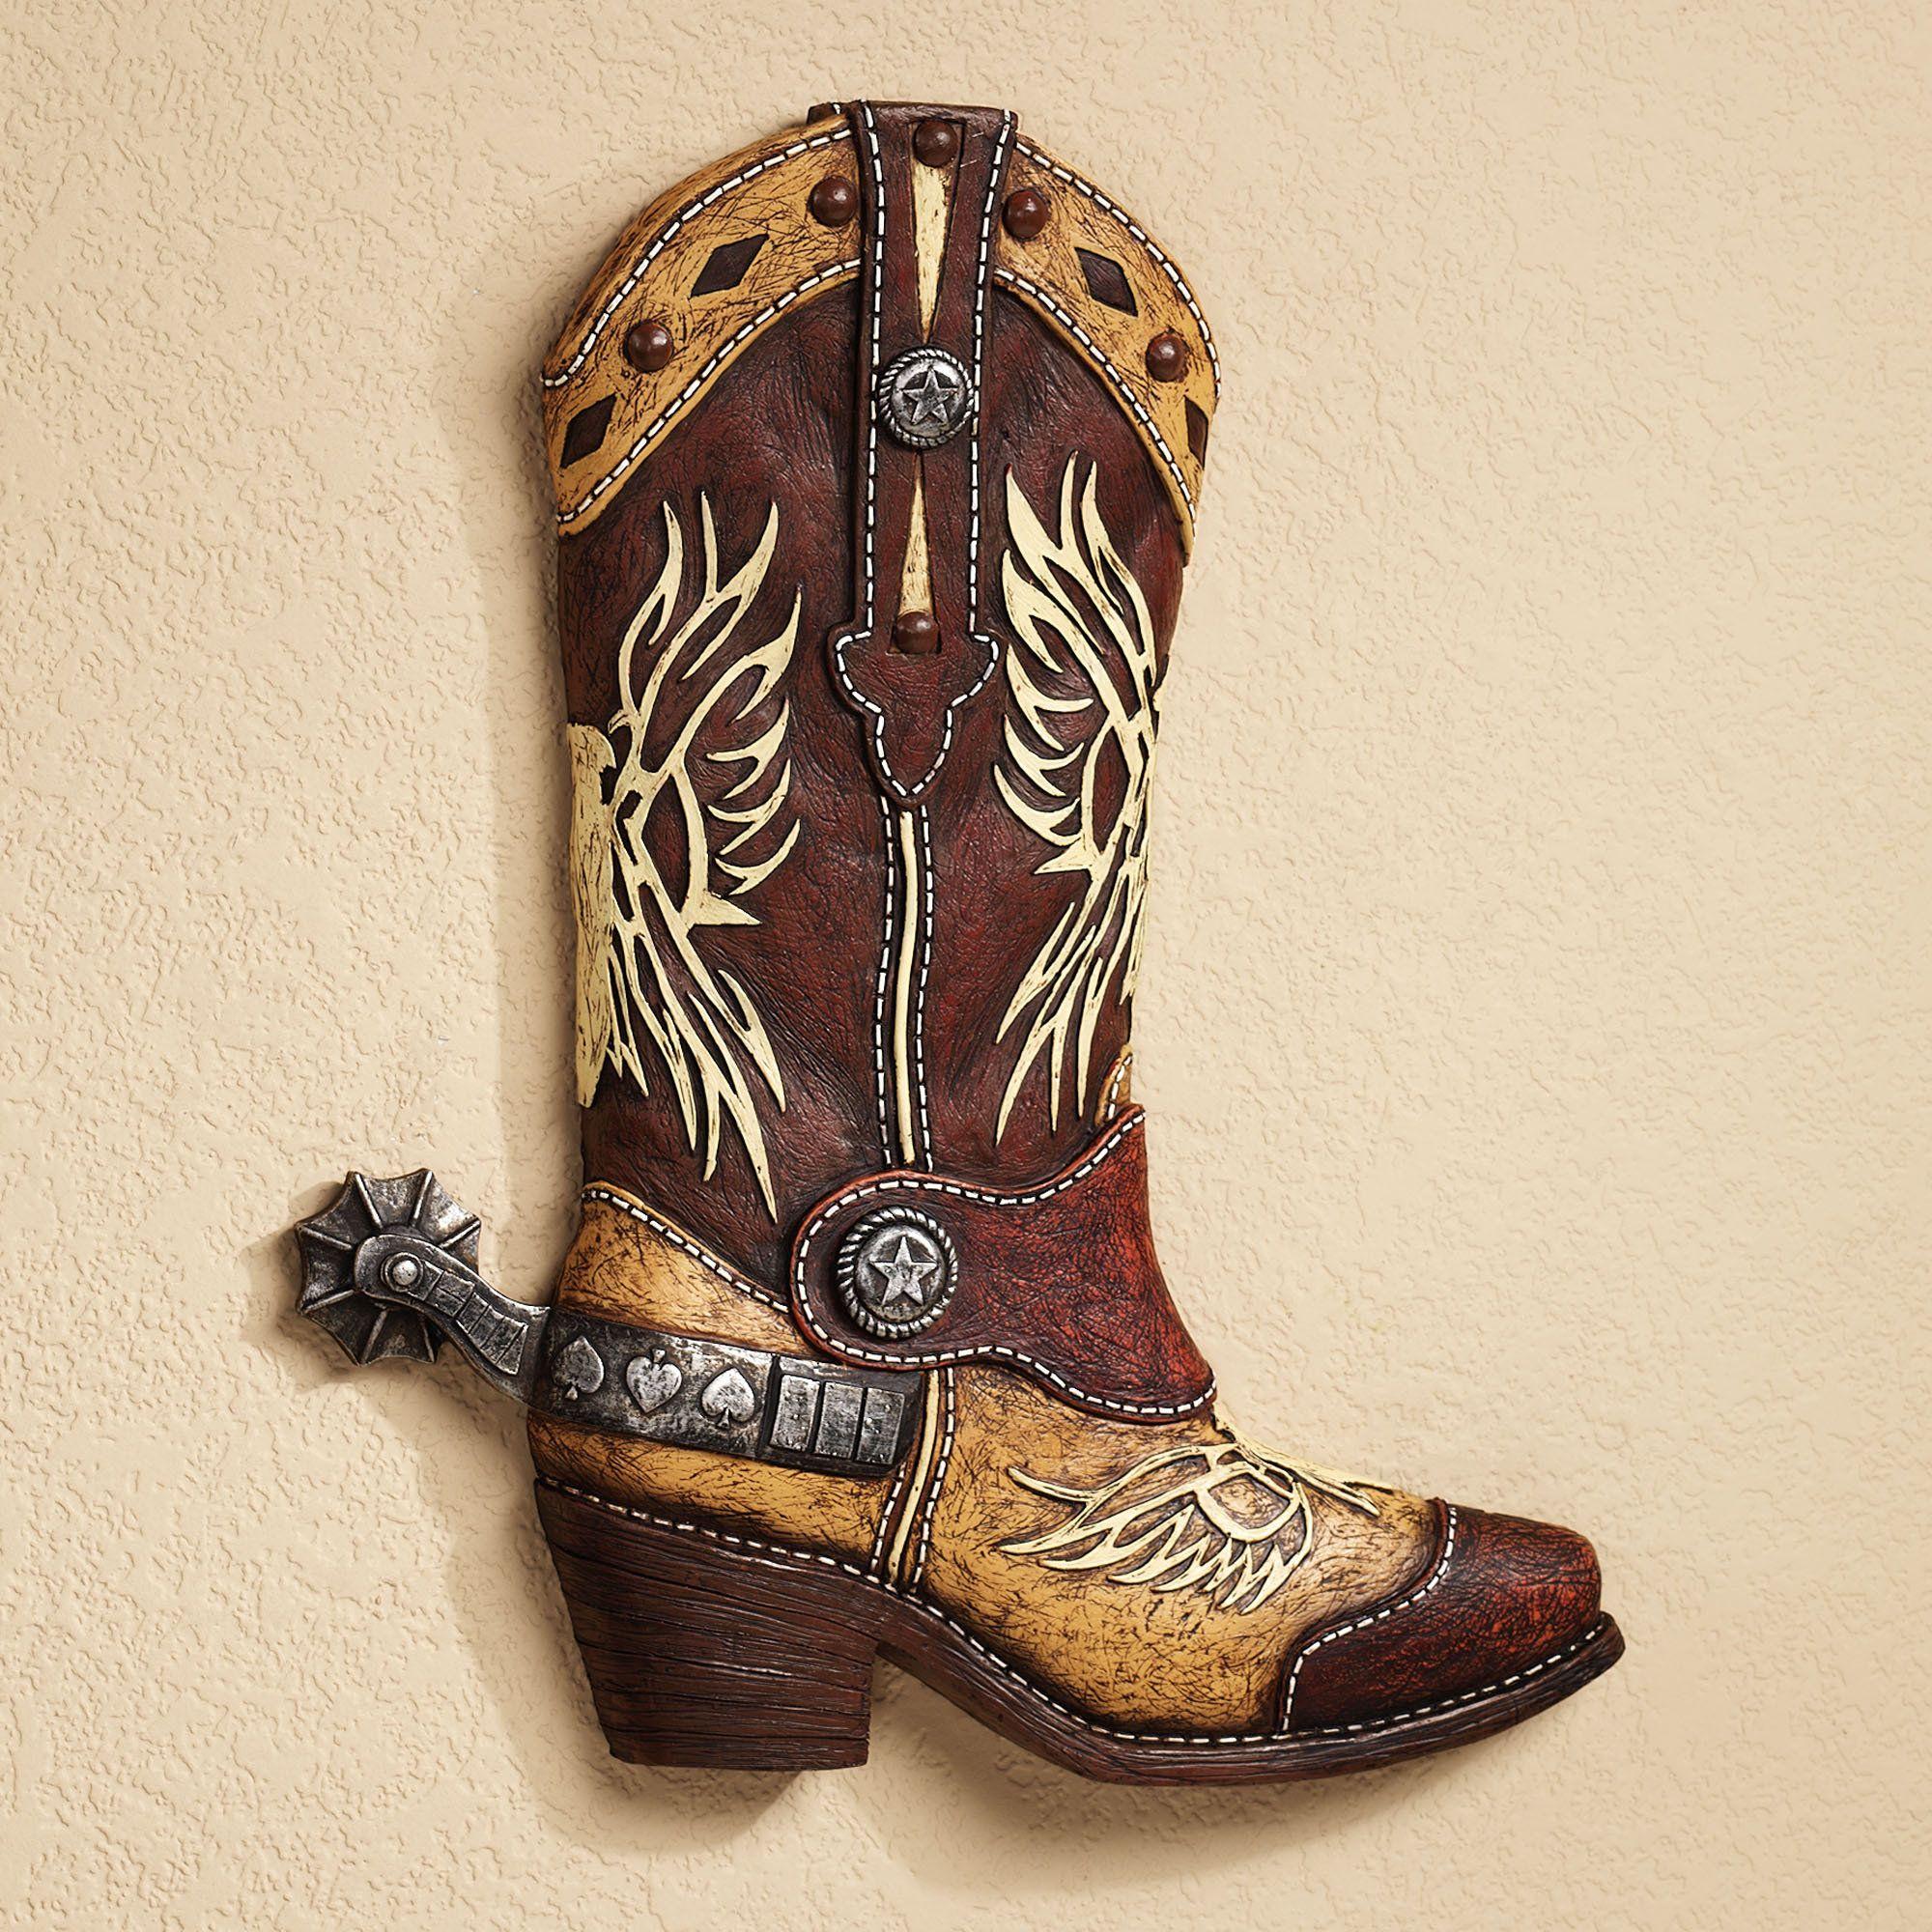 Cowboy boot bathroom decor - Cowboy Art Home Cowboy Boot Wall Art Multi Earth